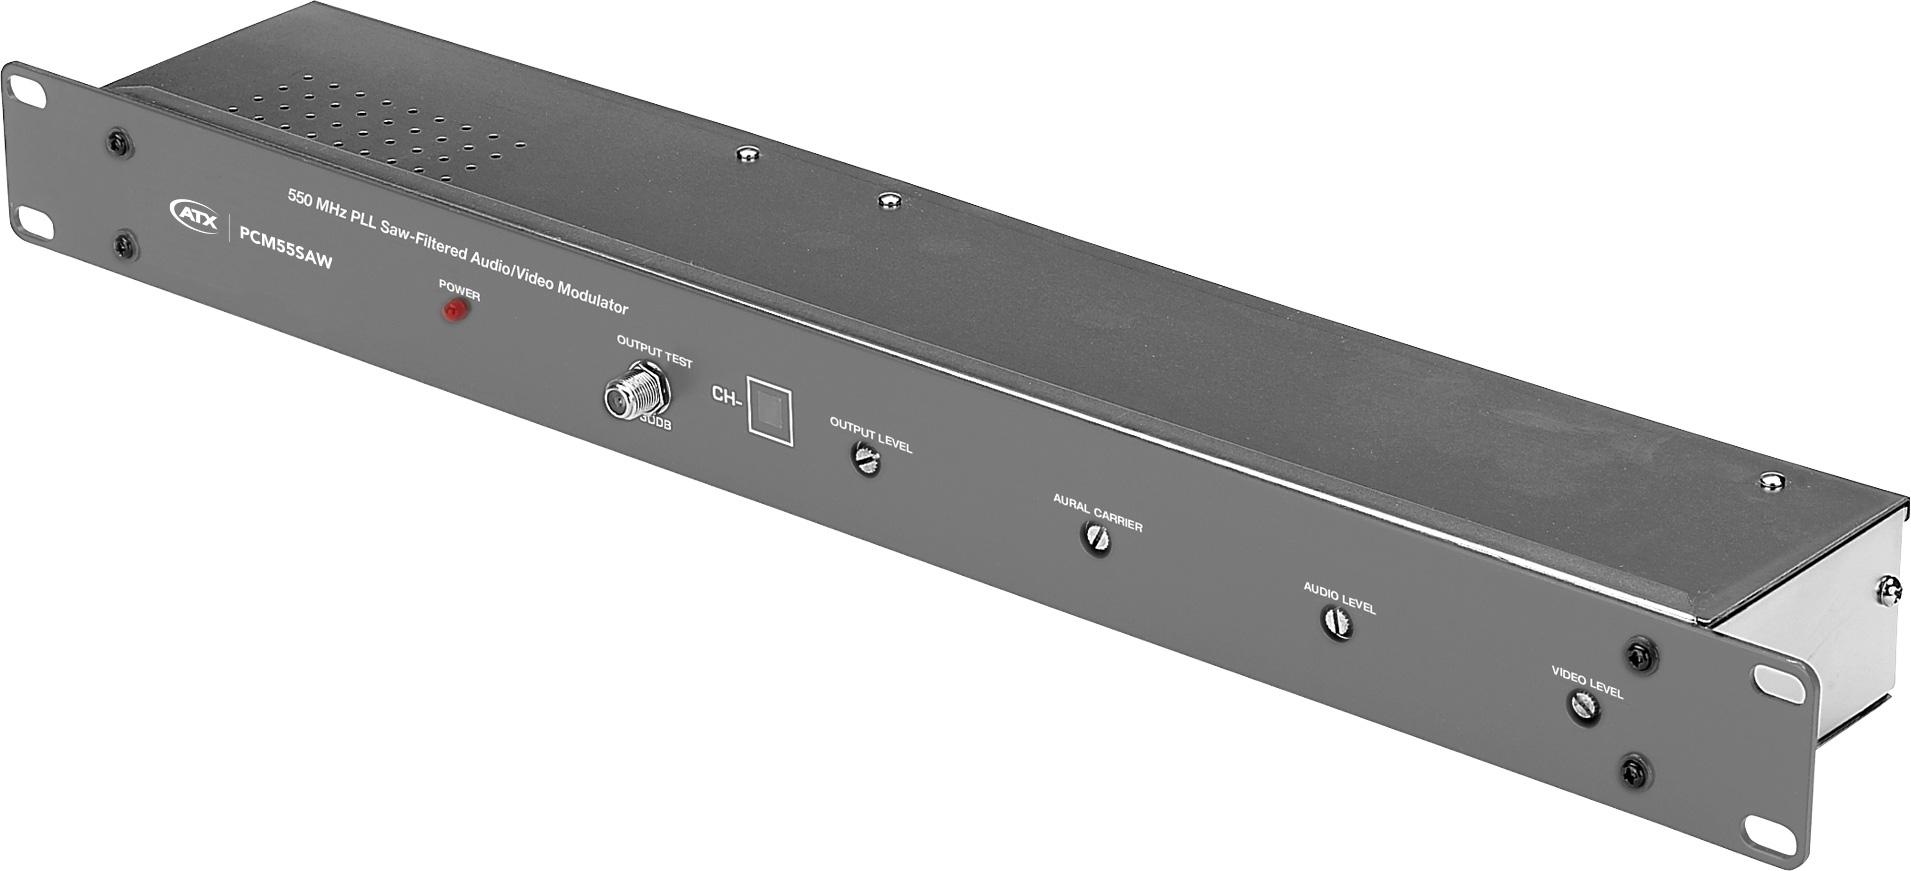 1 Channel Crystal A/V Modulator - Channel 22 or I PM-PCM55SAW-22